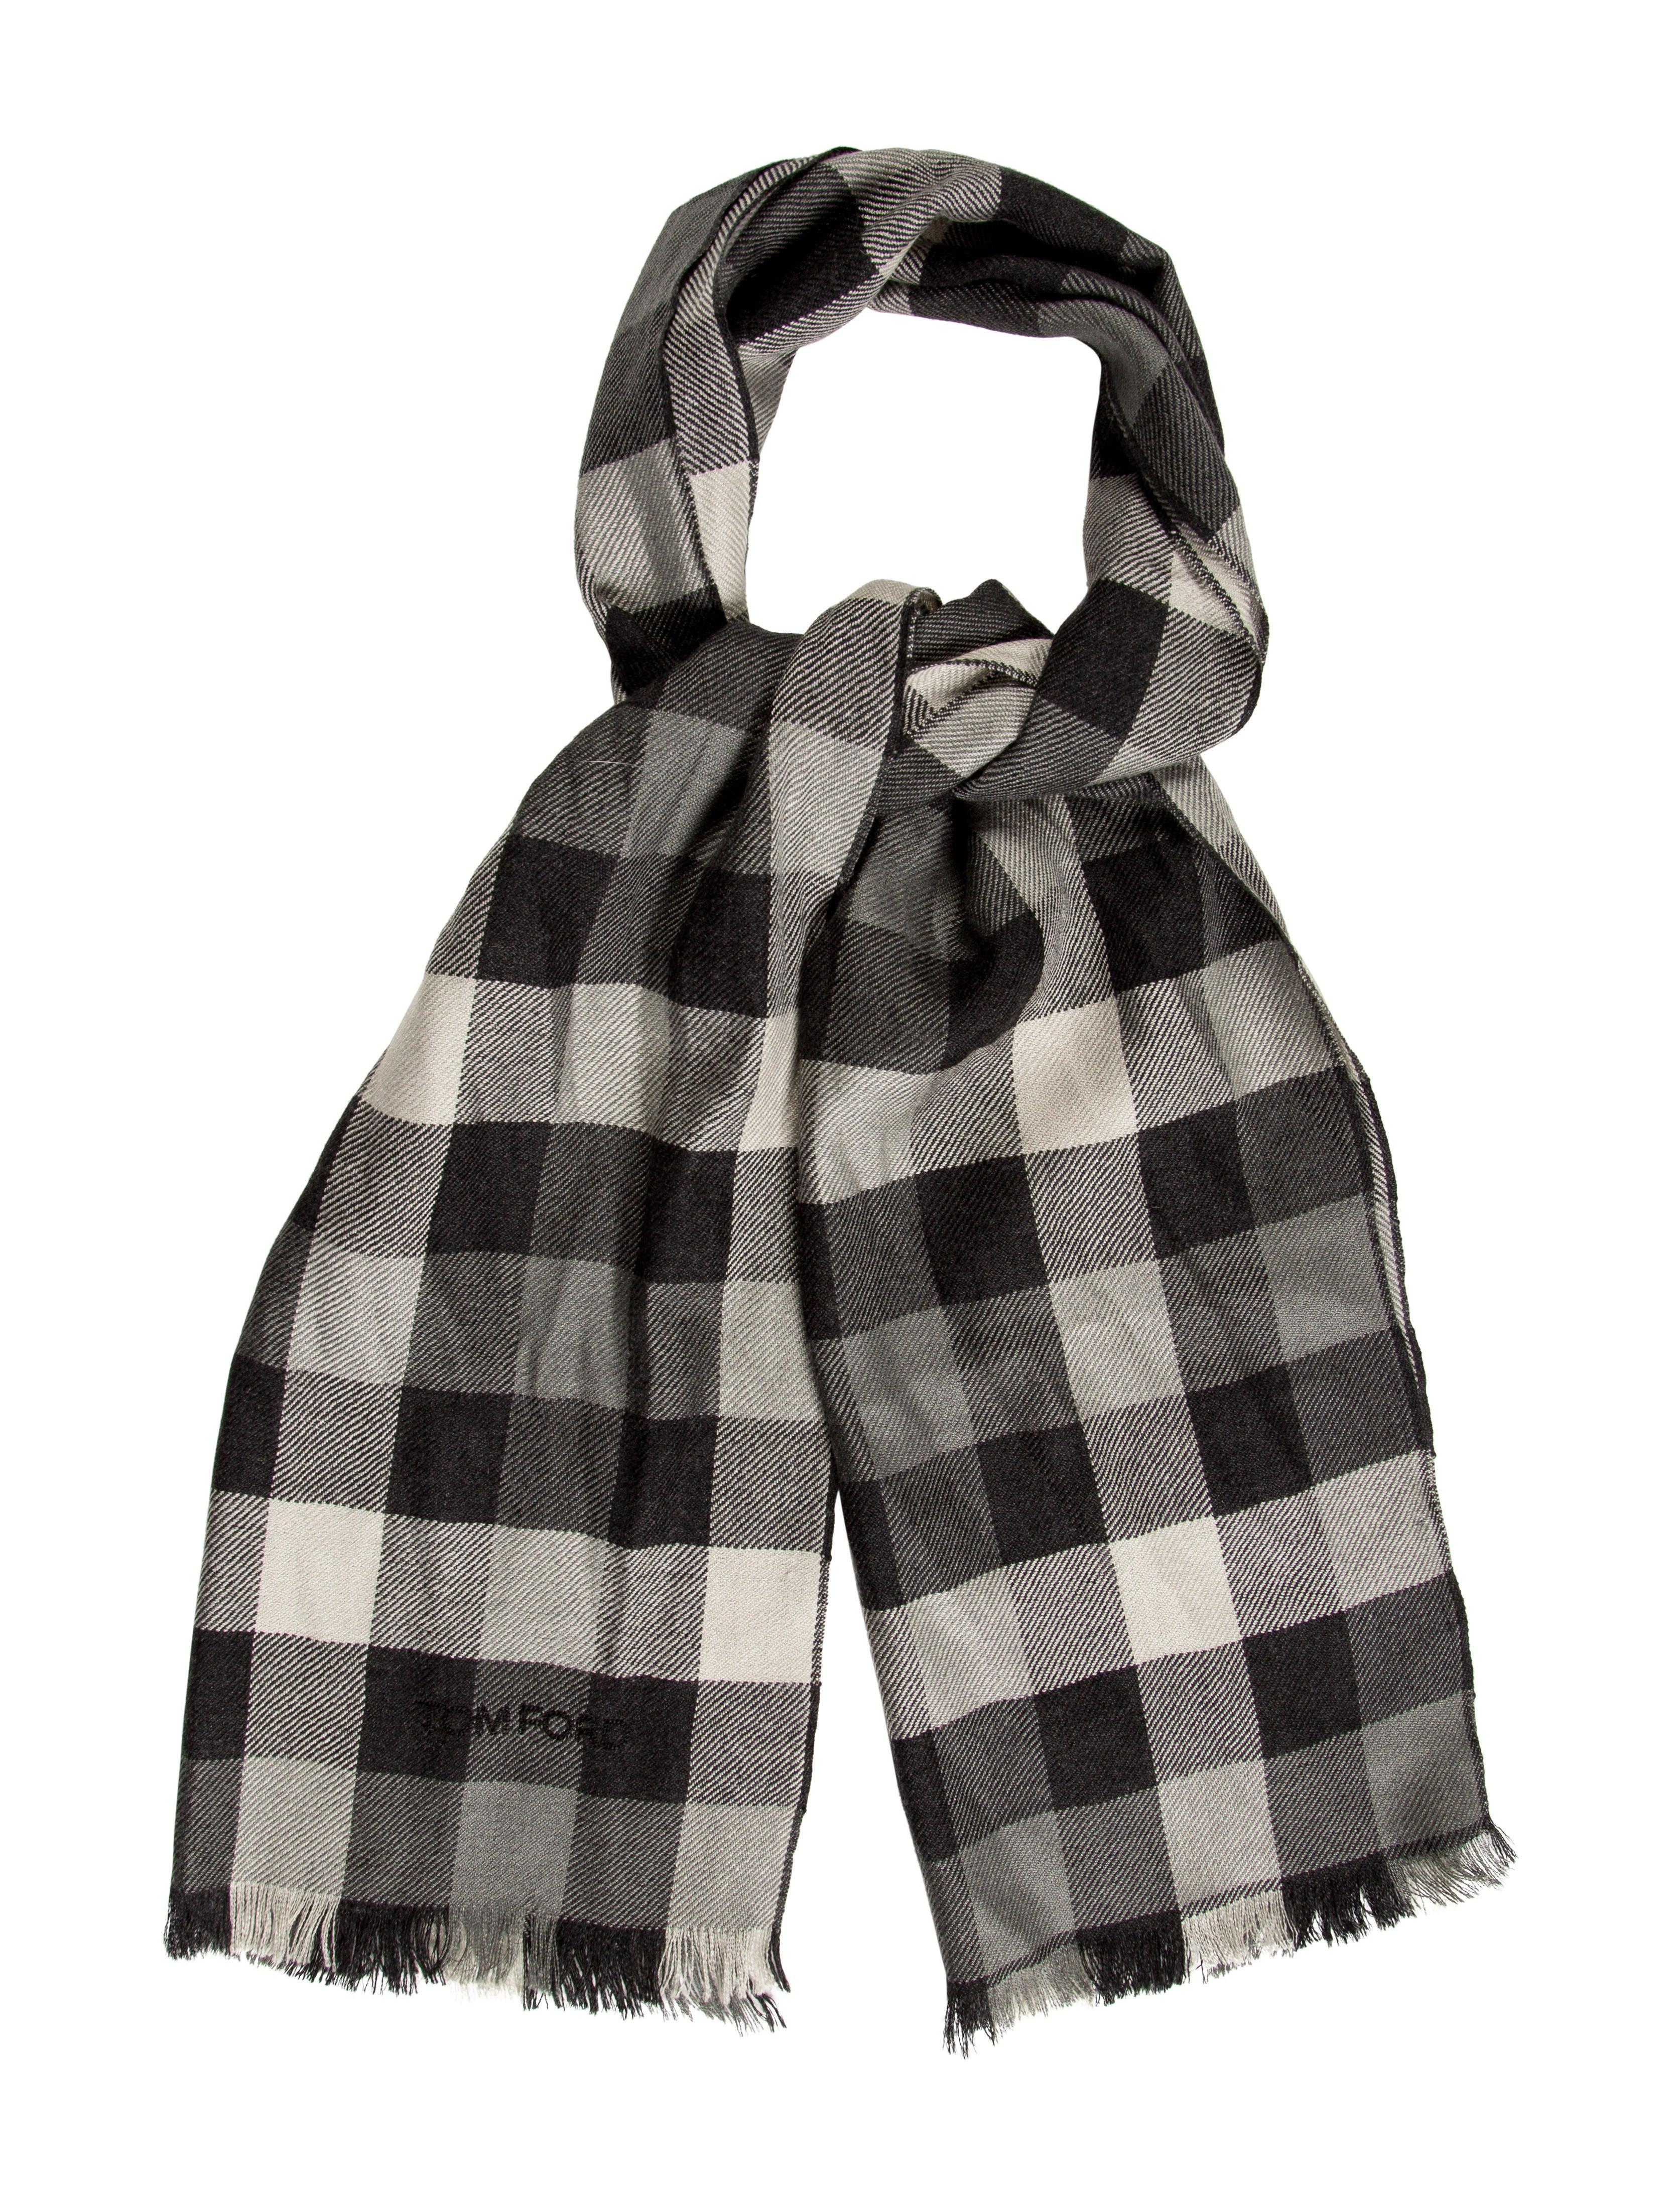 tom ford silk blend scarf accessories